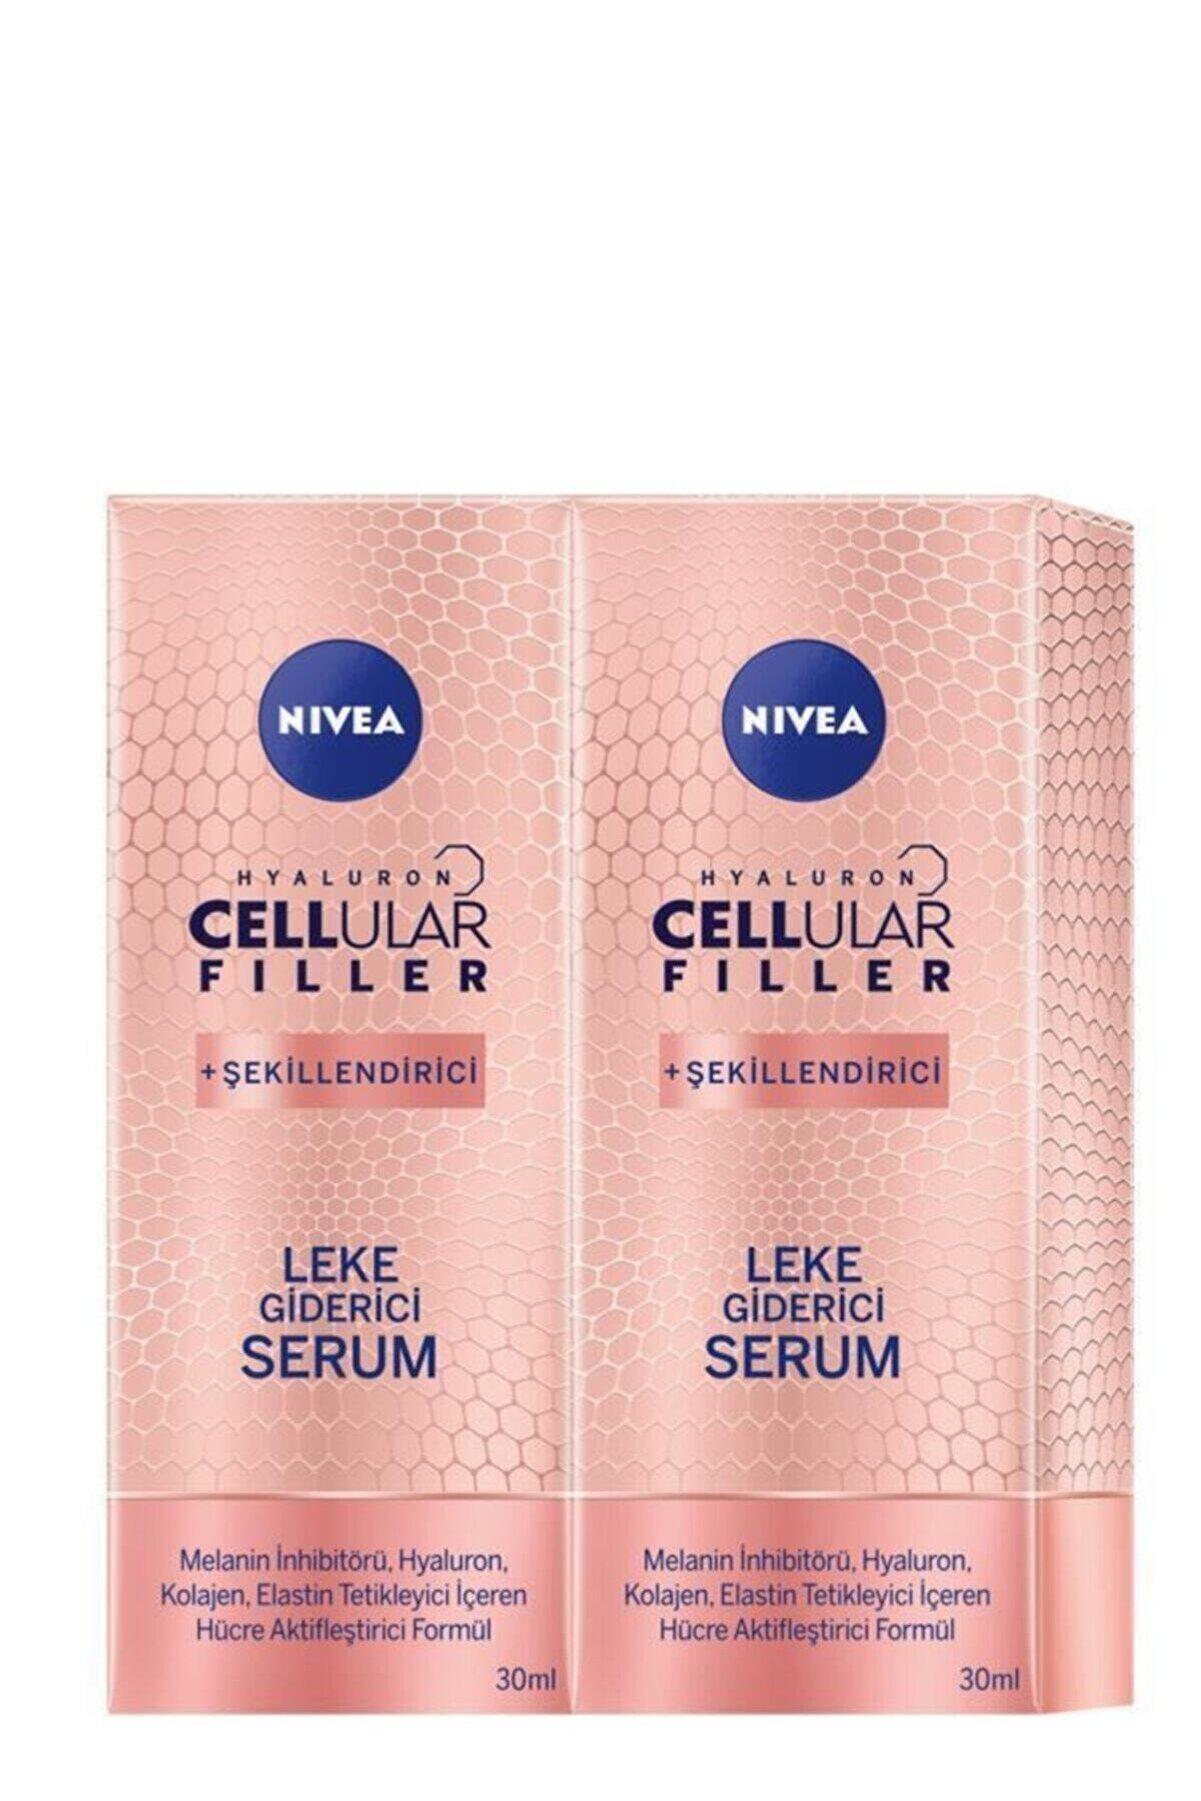 Nivea Hyaluron Cellular Filler Leke Giderici Serum 30 ml X 2